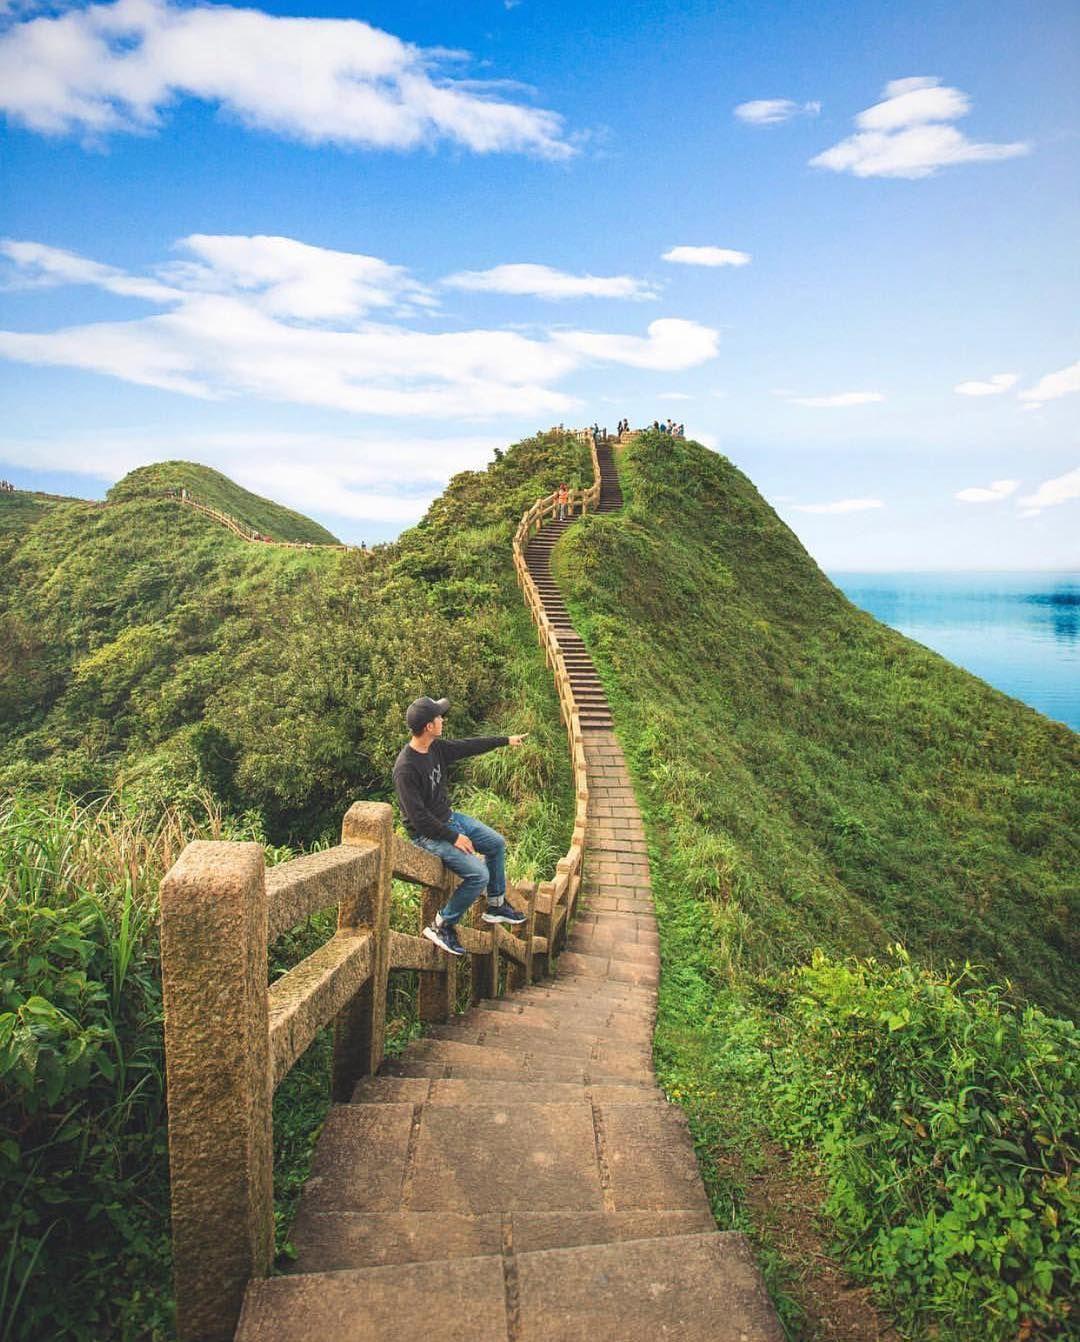 Bitou Cape Hiking Trail Ruifang Hiking Trails Tourism Day Hike